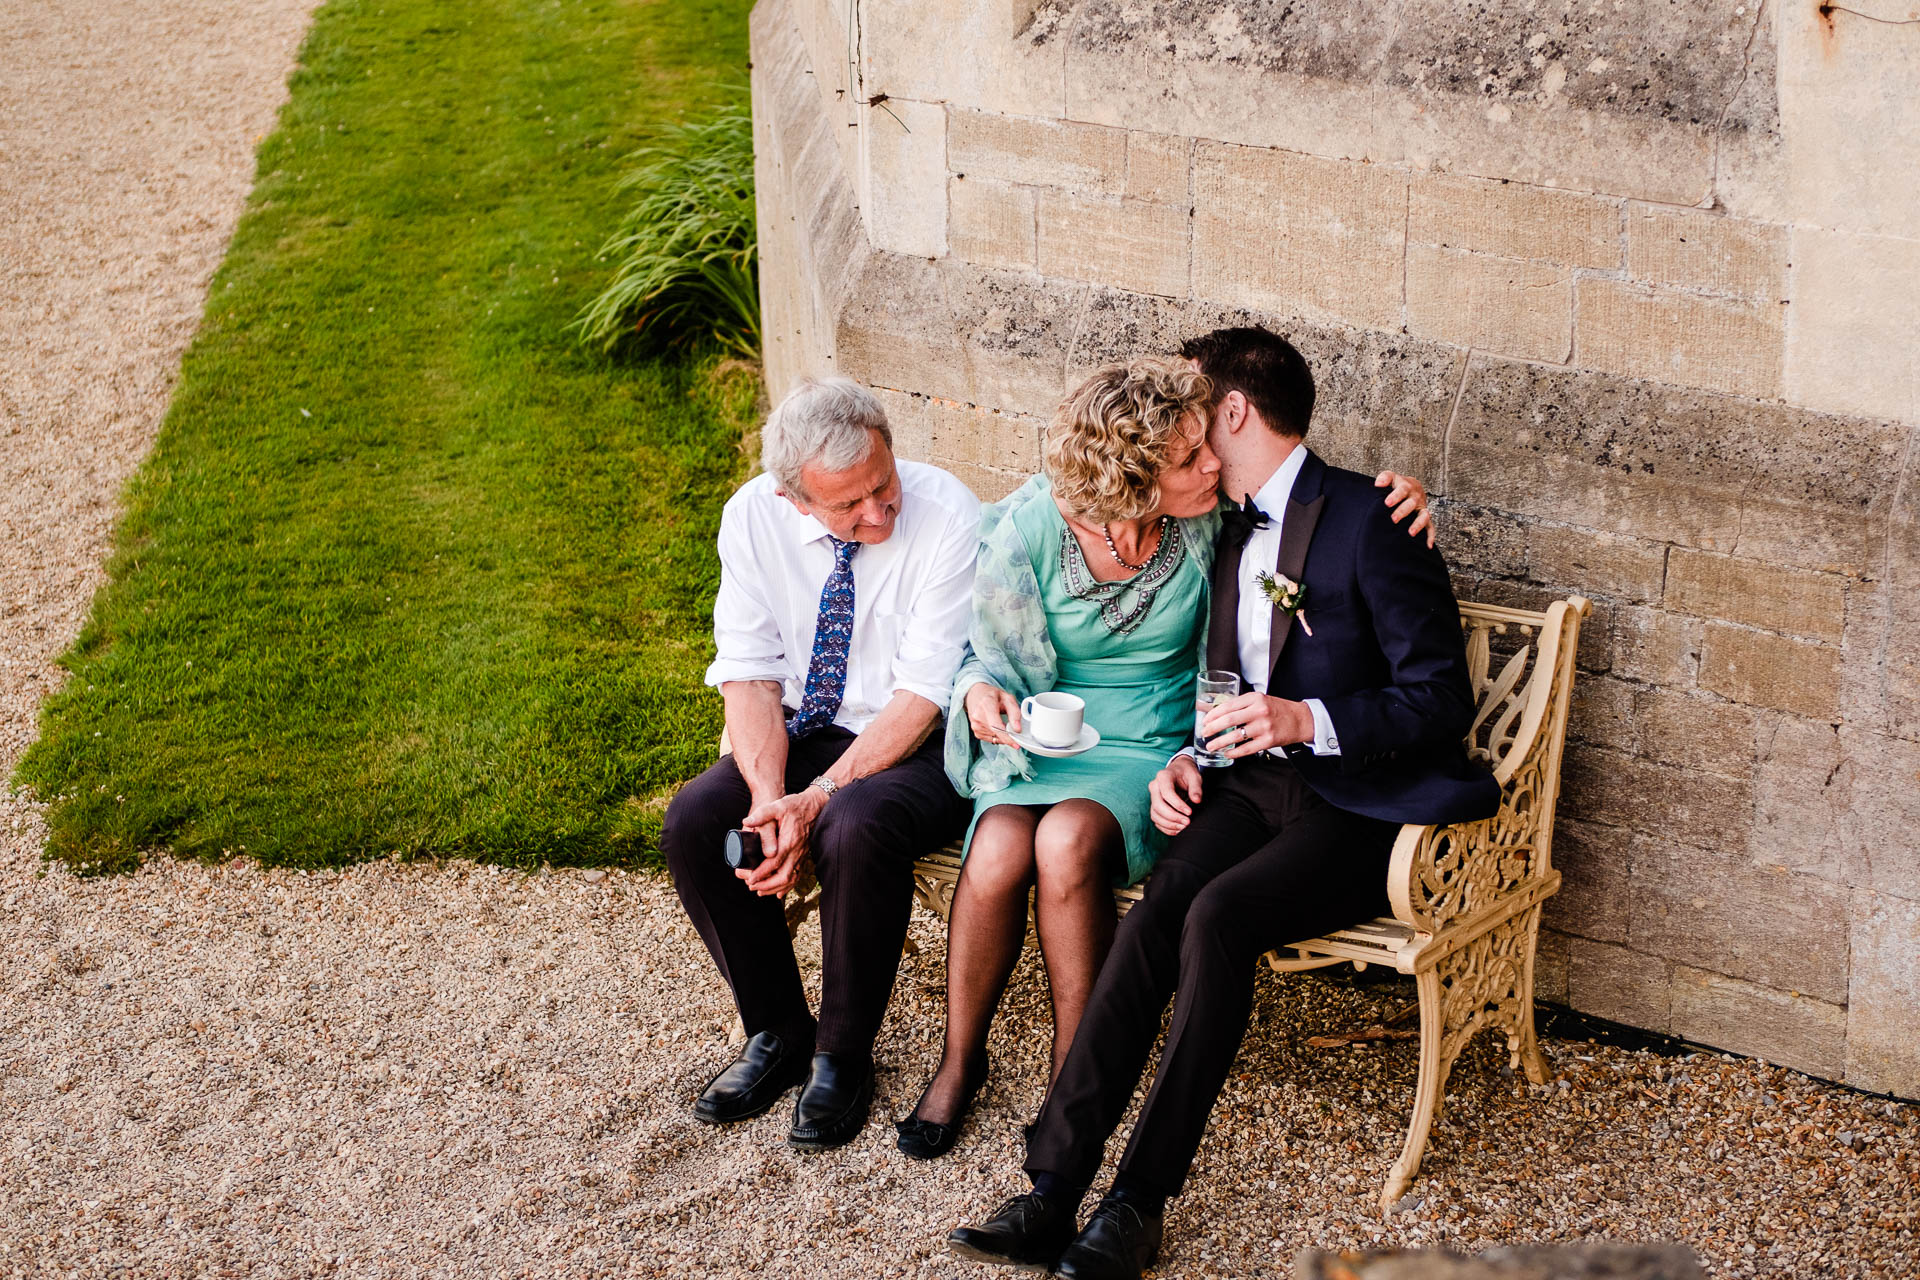 orchardleigh house wedding - Danni & Barney (481).jpg